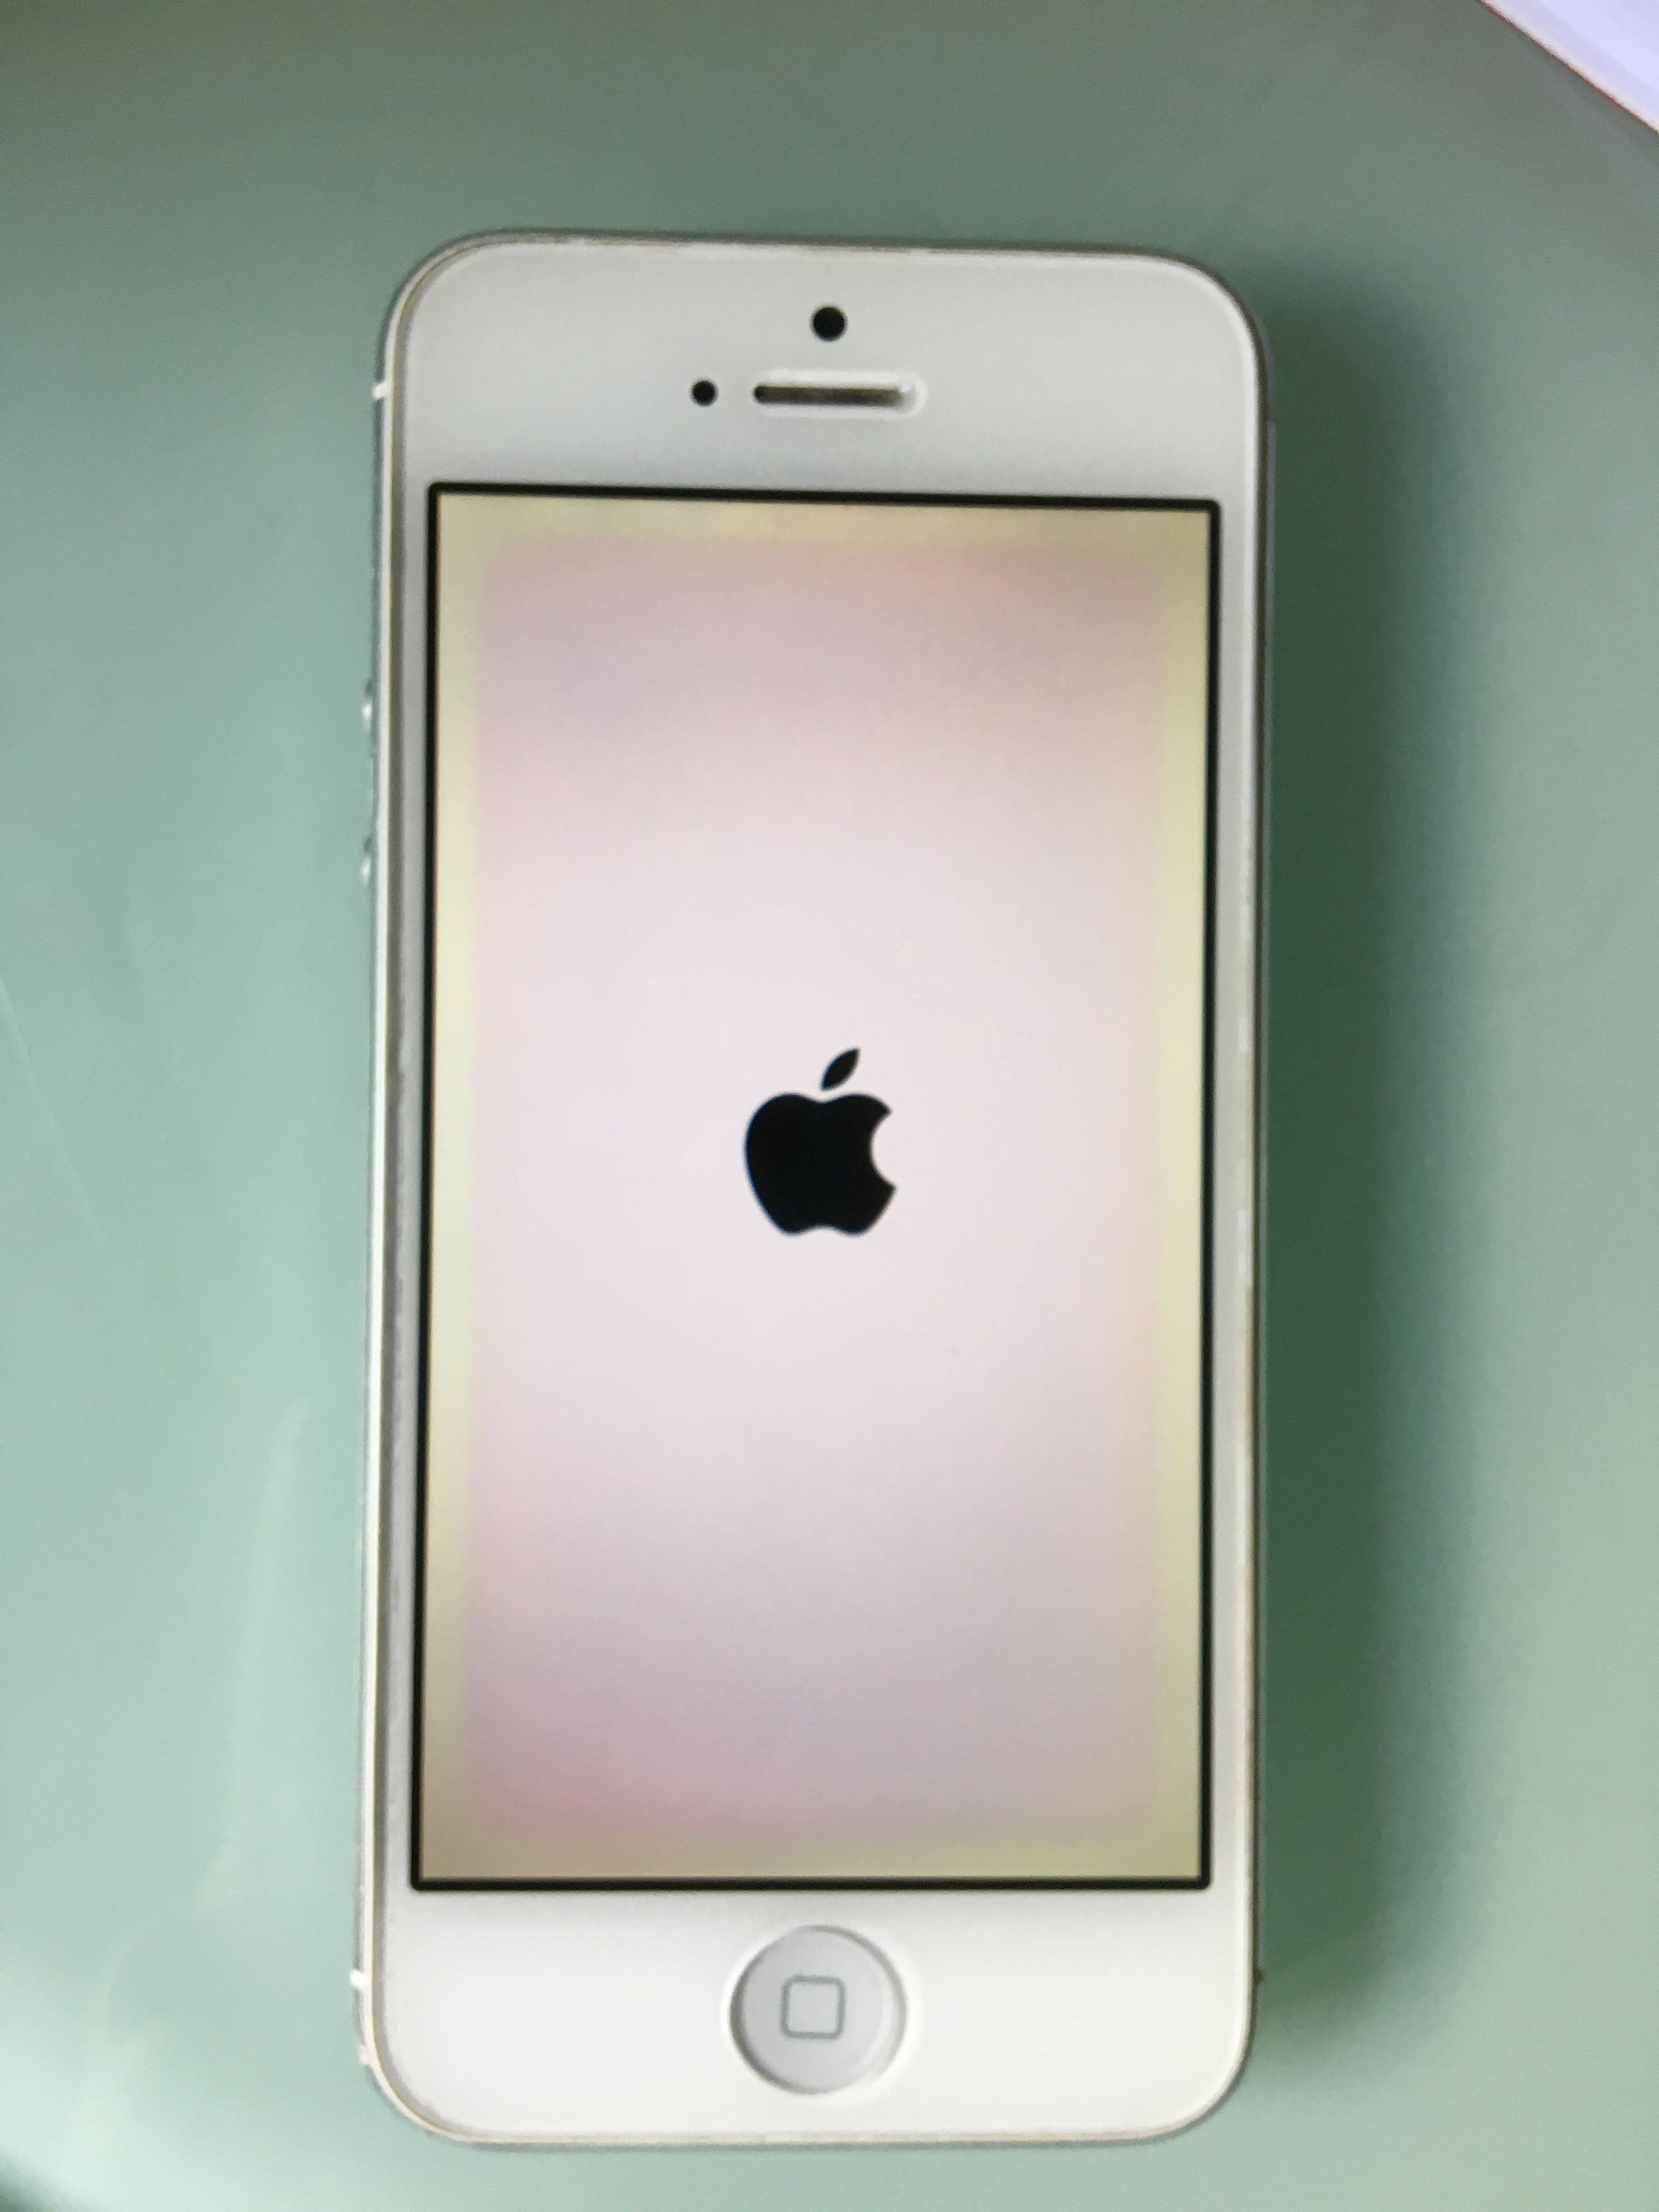 iphone 5 segunda mano madrid barato